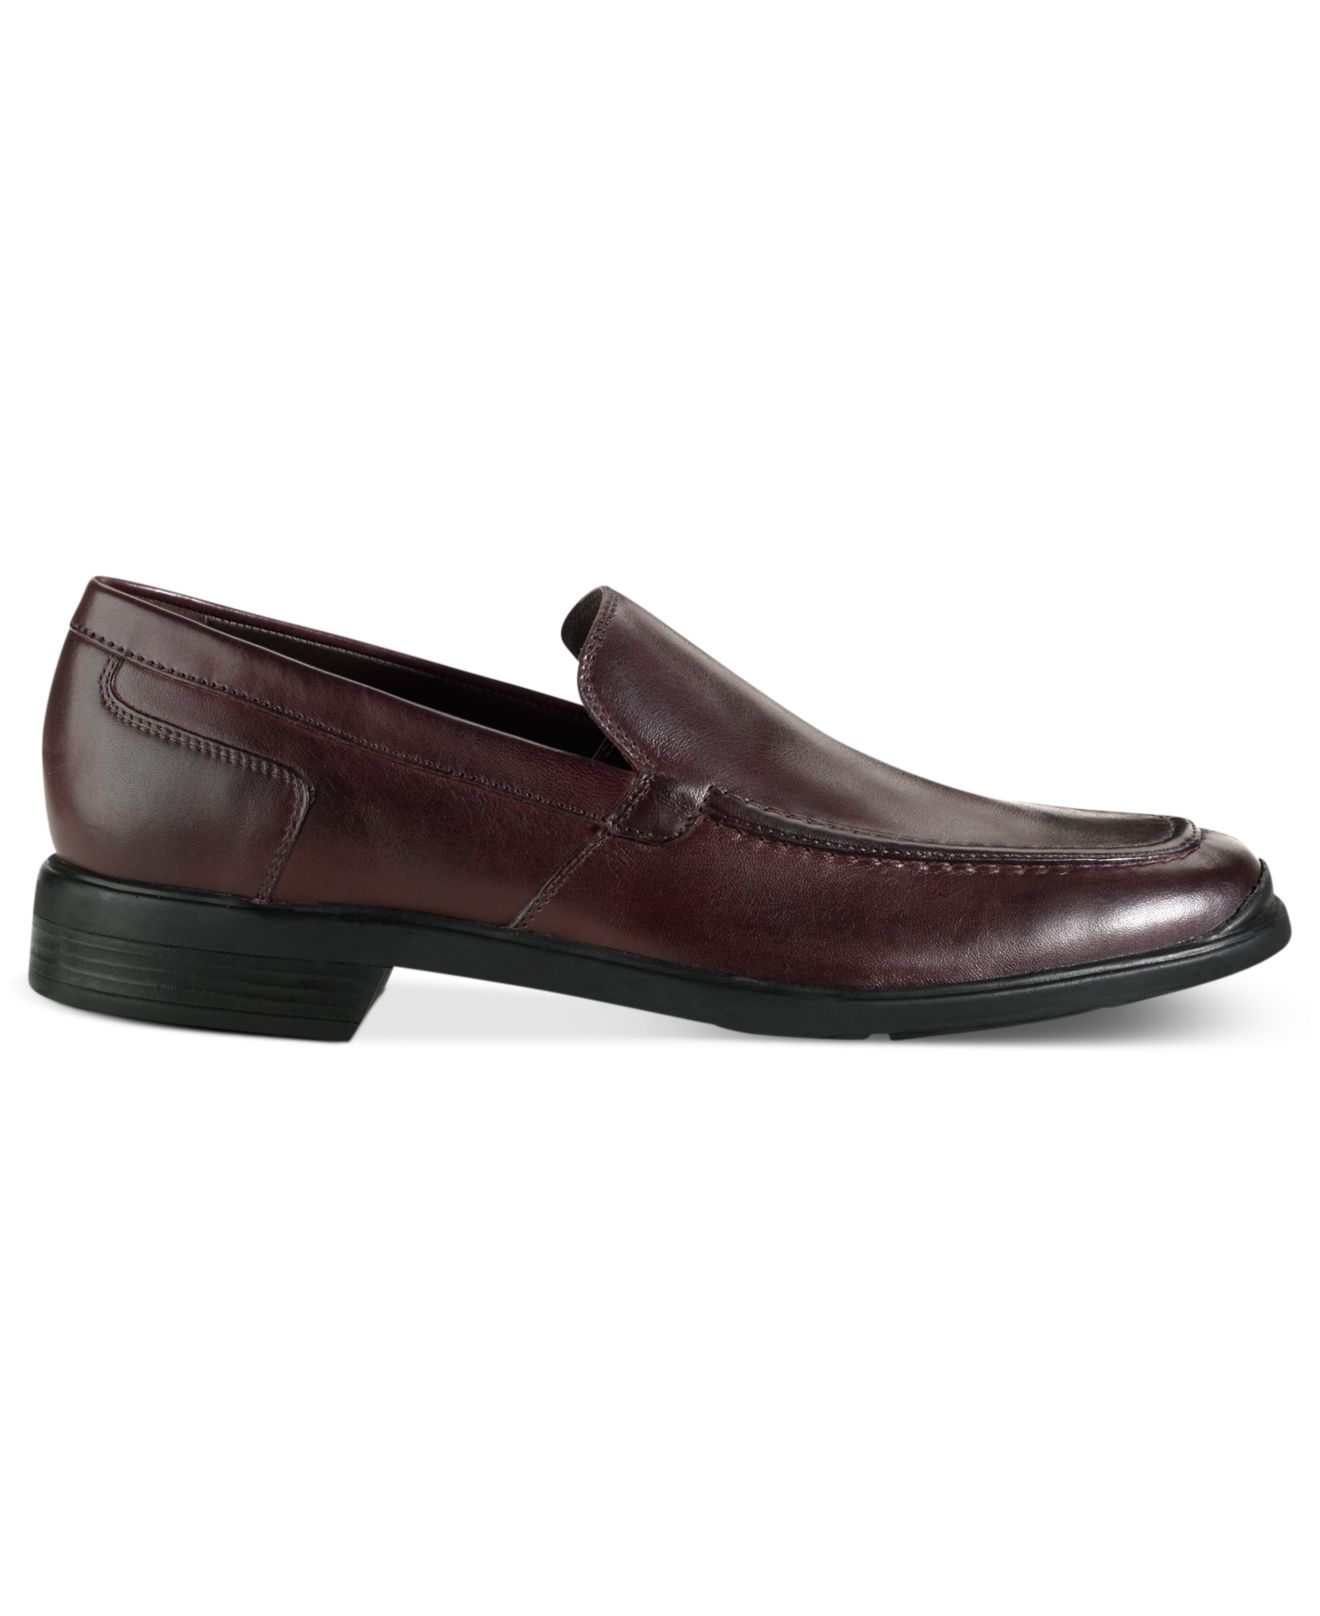 Cole Haan Air Stylar Split Venetian Shoes